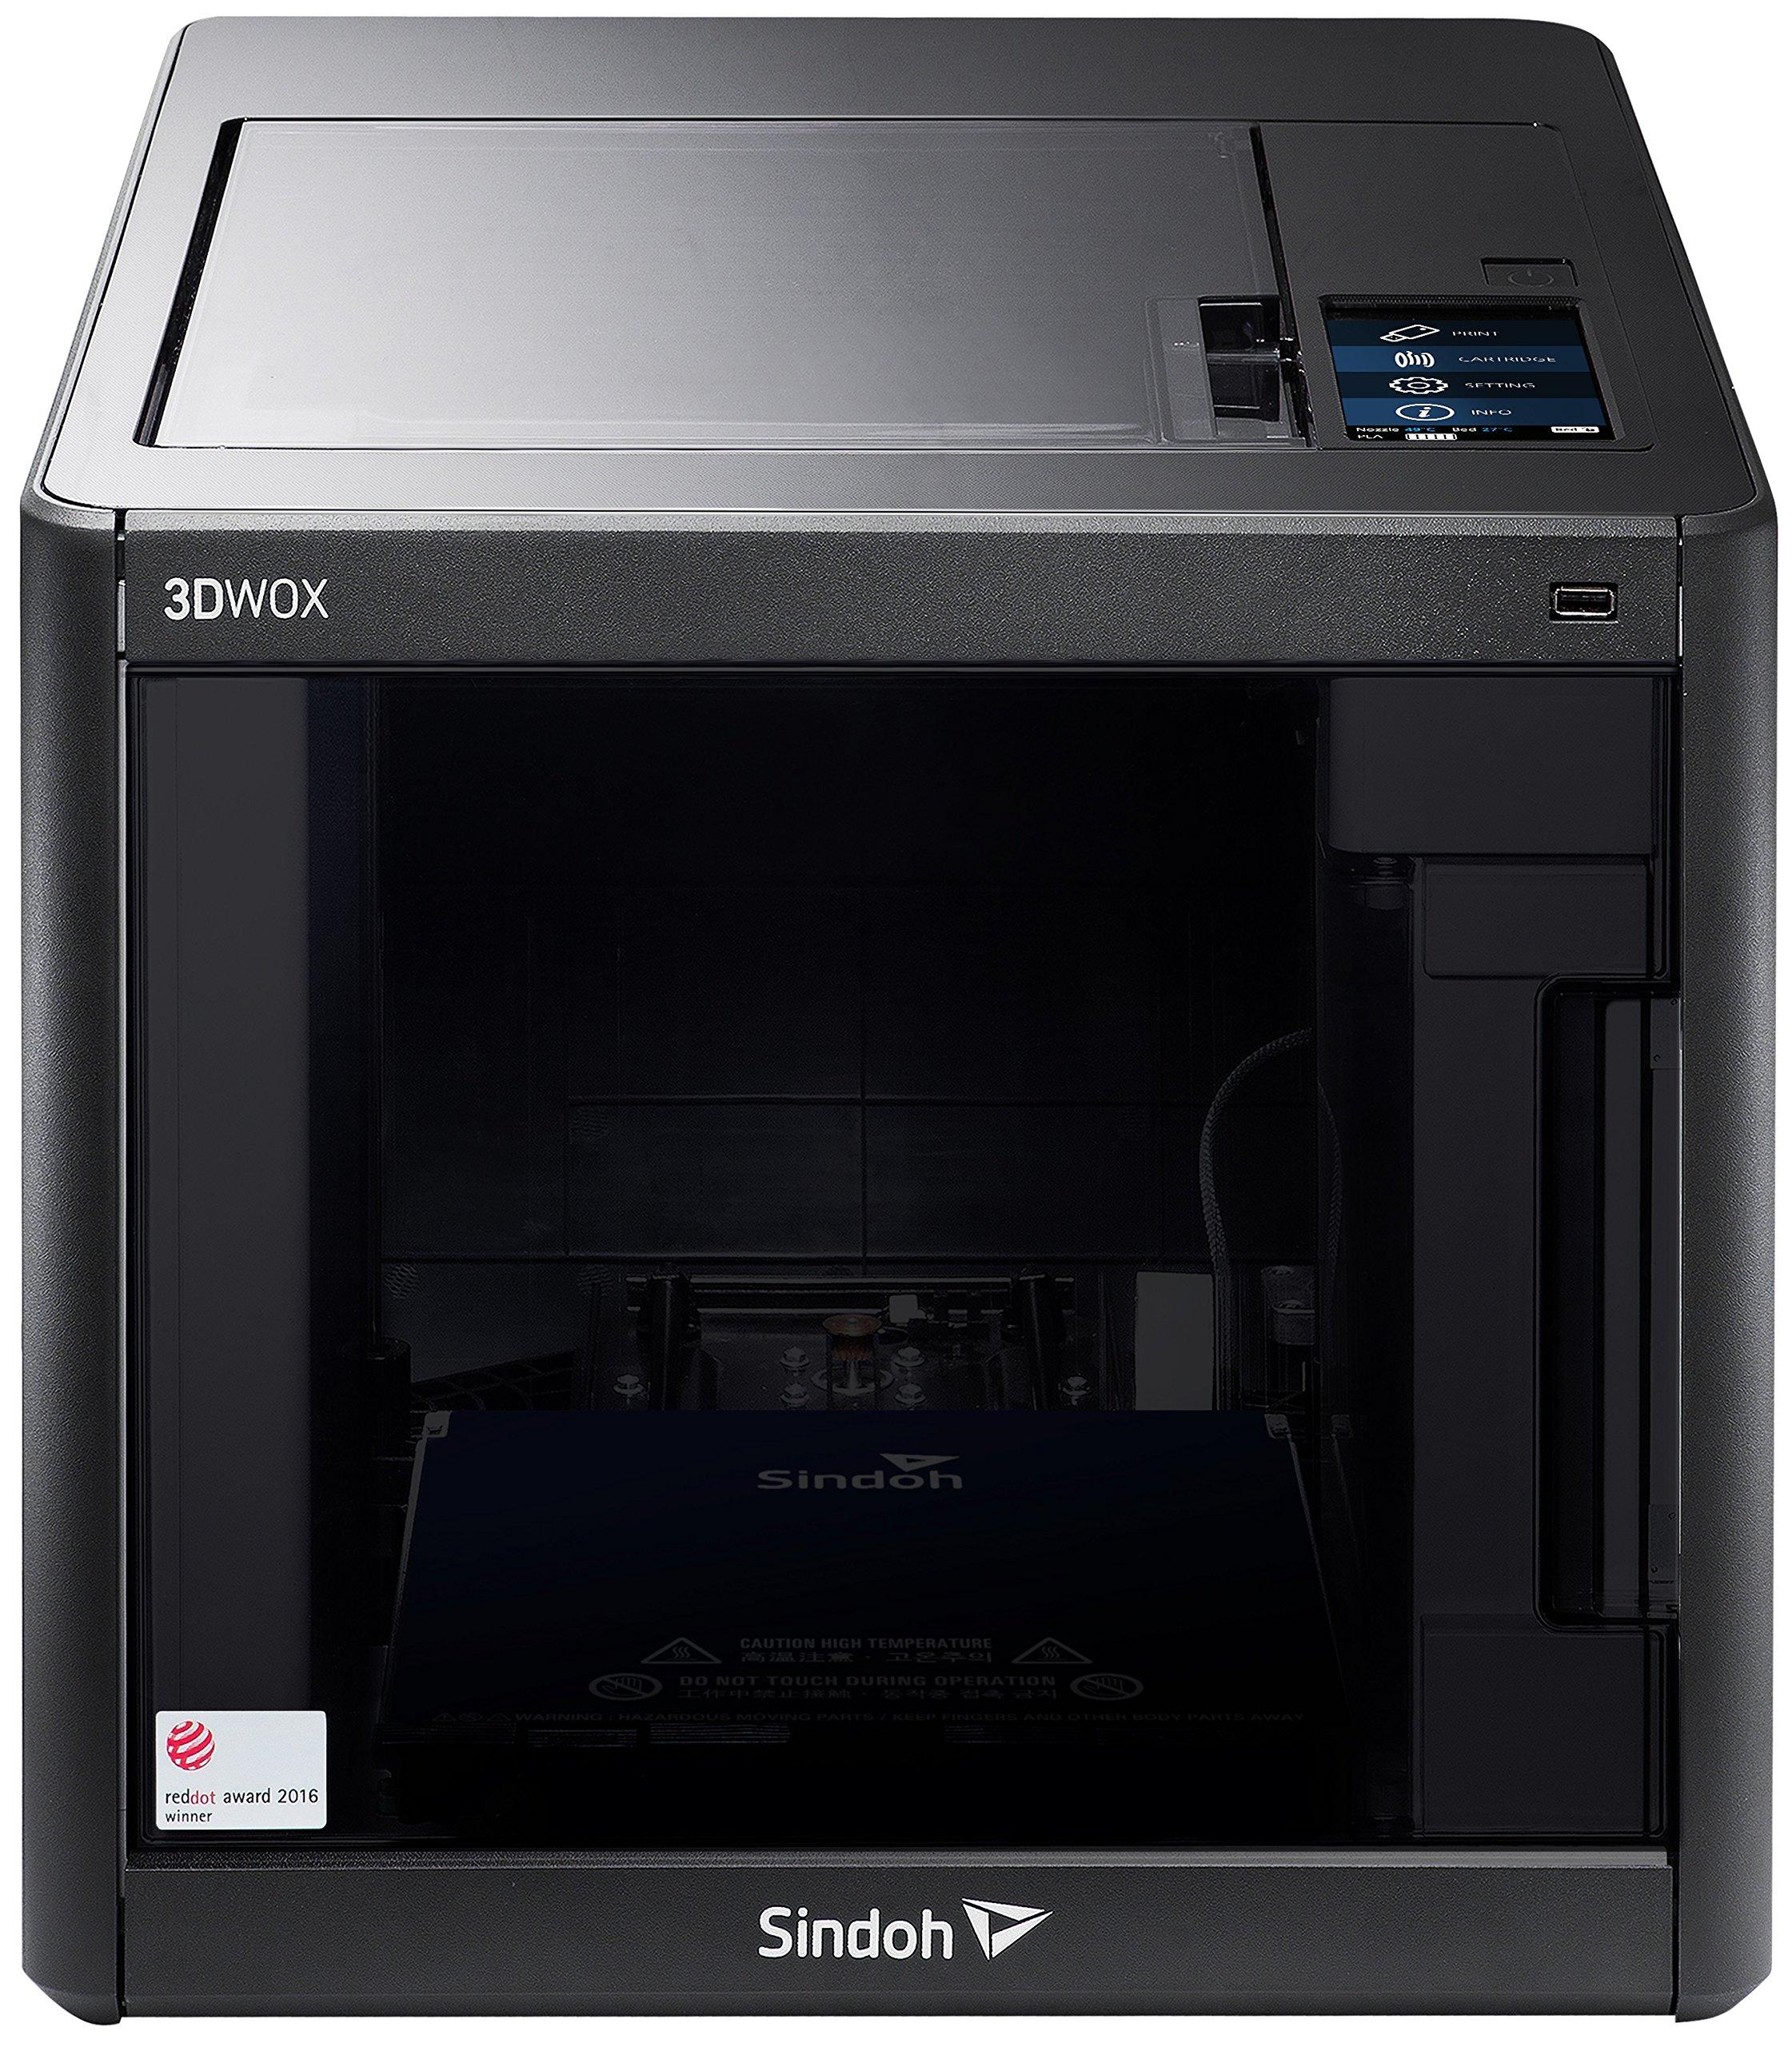 Sindoh 3DWOX DP200 3D Printer by Sindoh